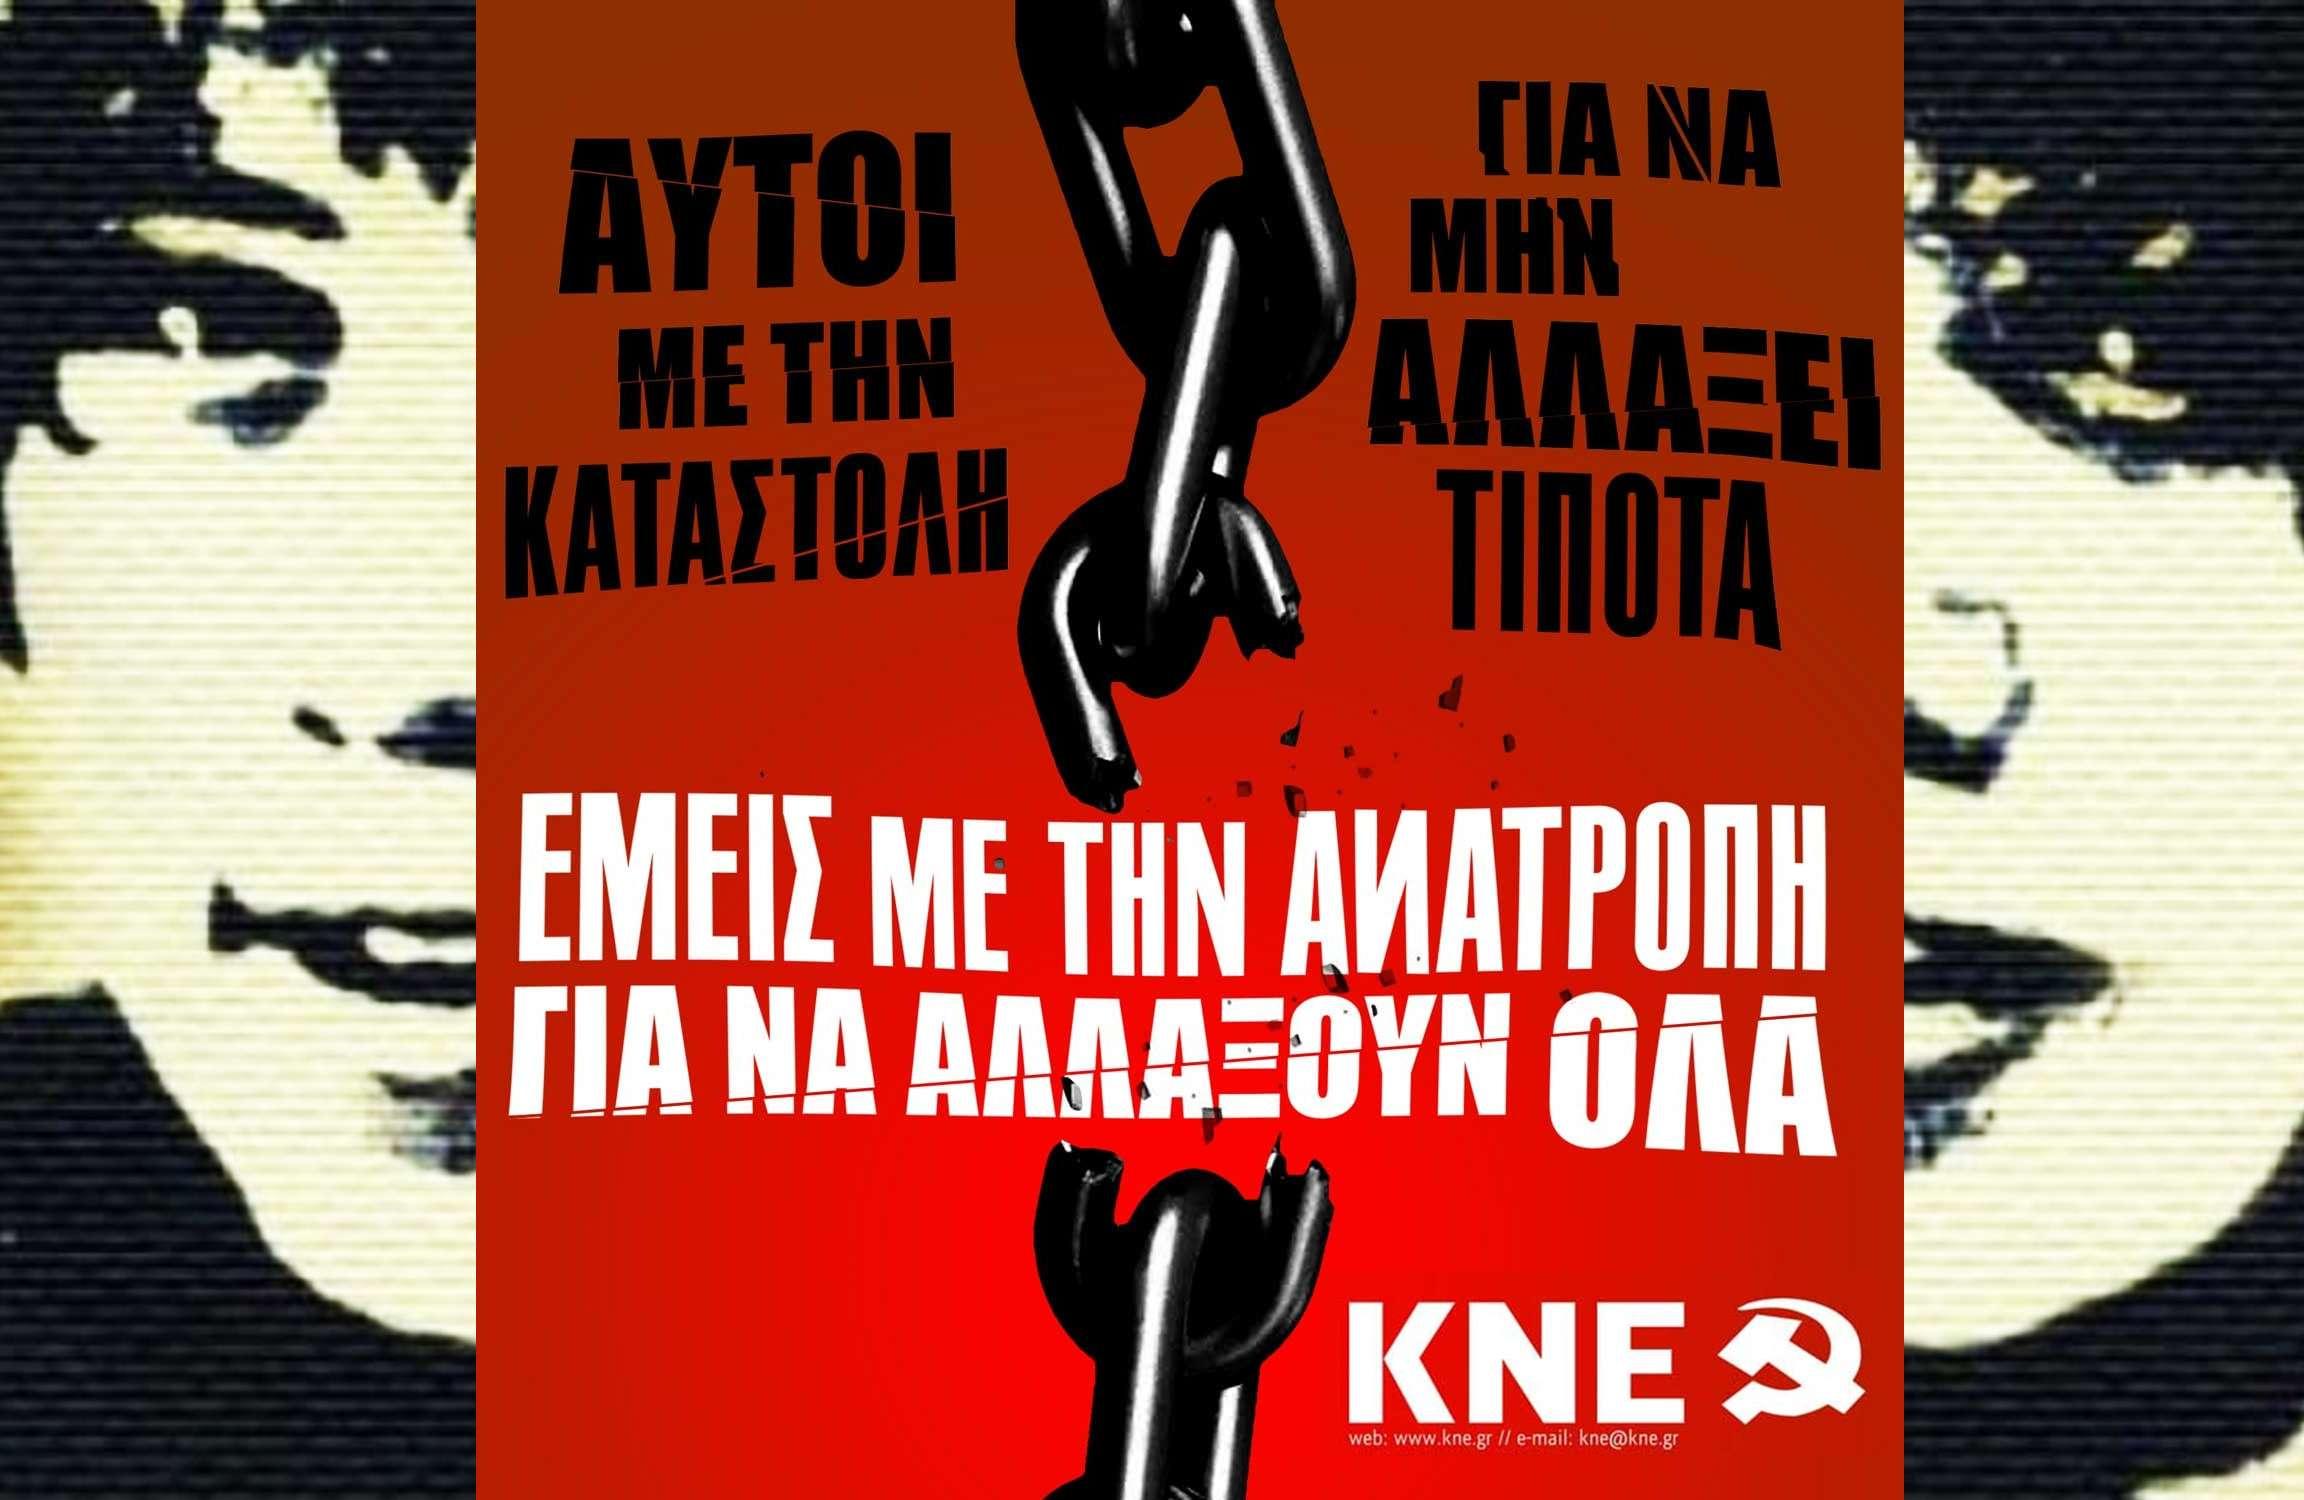 KNE_ΚΝΕ Γρηγορόπουλος Grhgoropoulos 2020